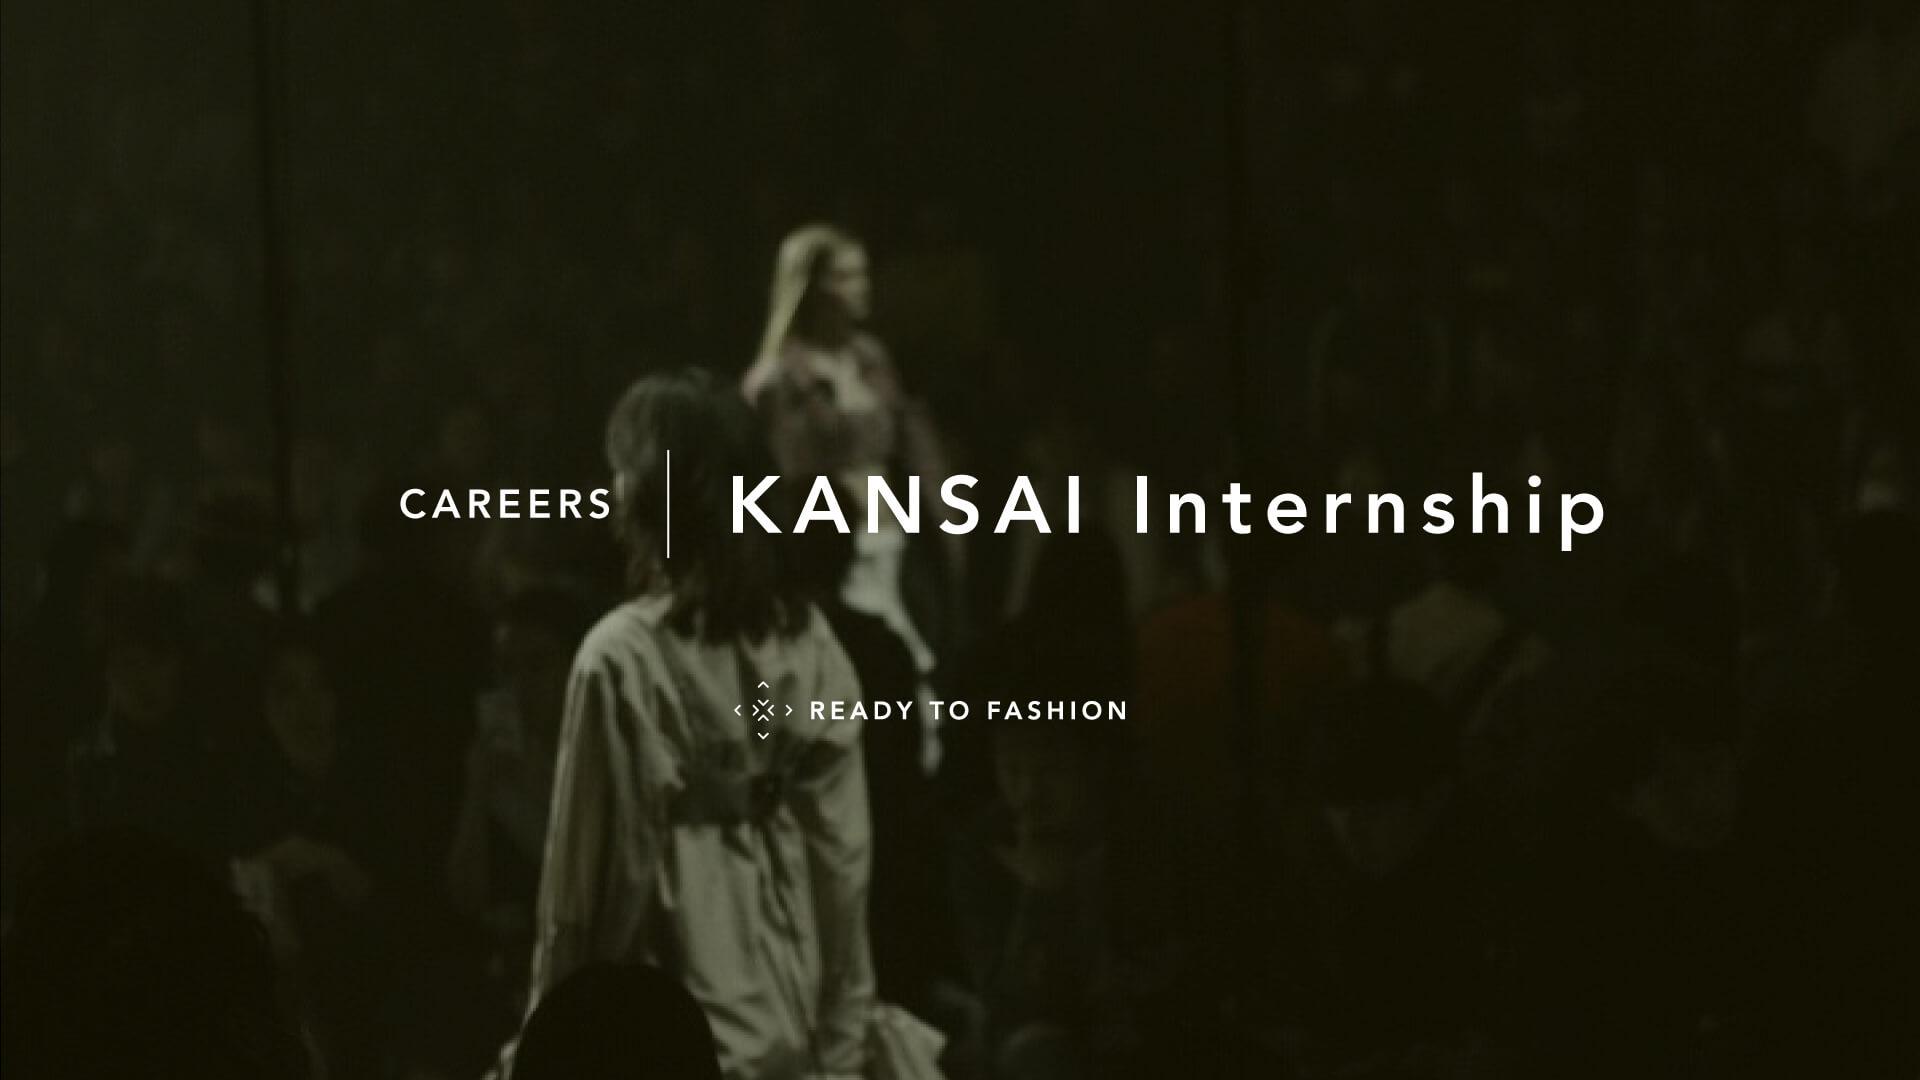 fashion community 1.0 関西支部マネジメントに挑戦したい人のカバー写真